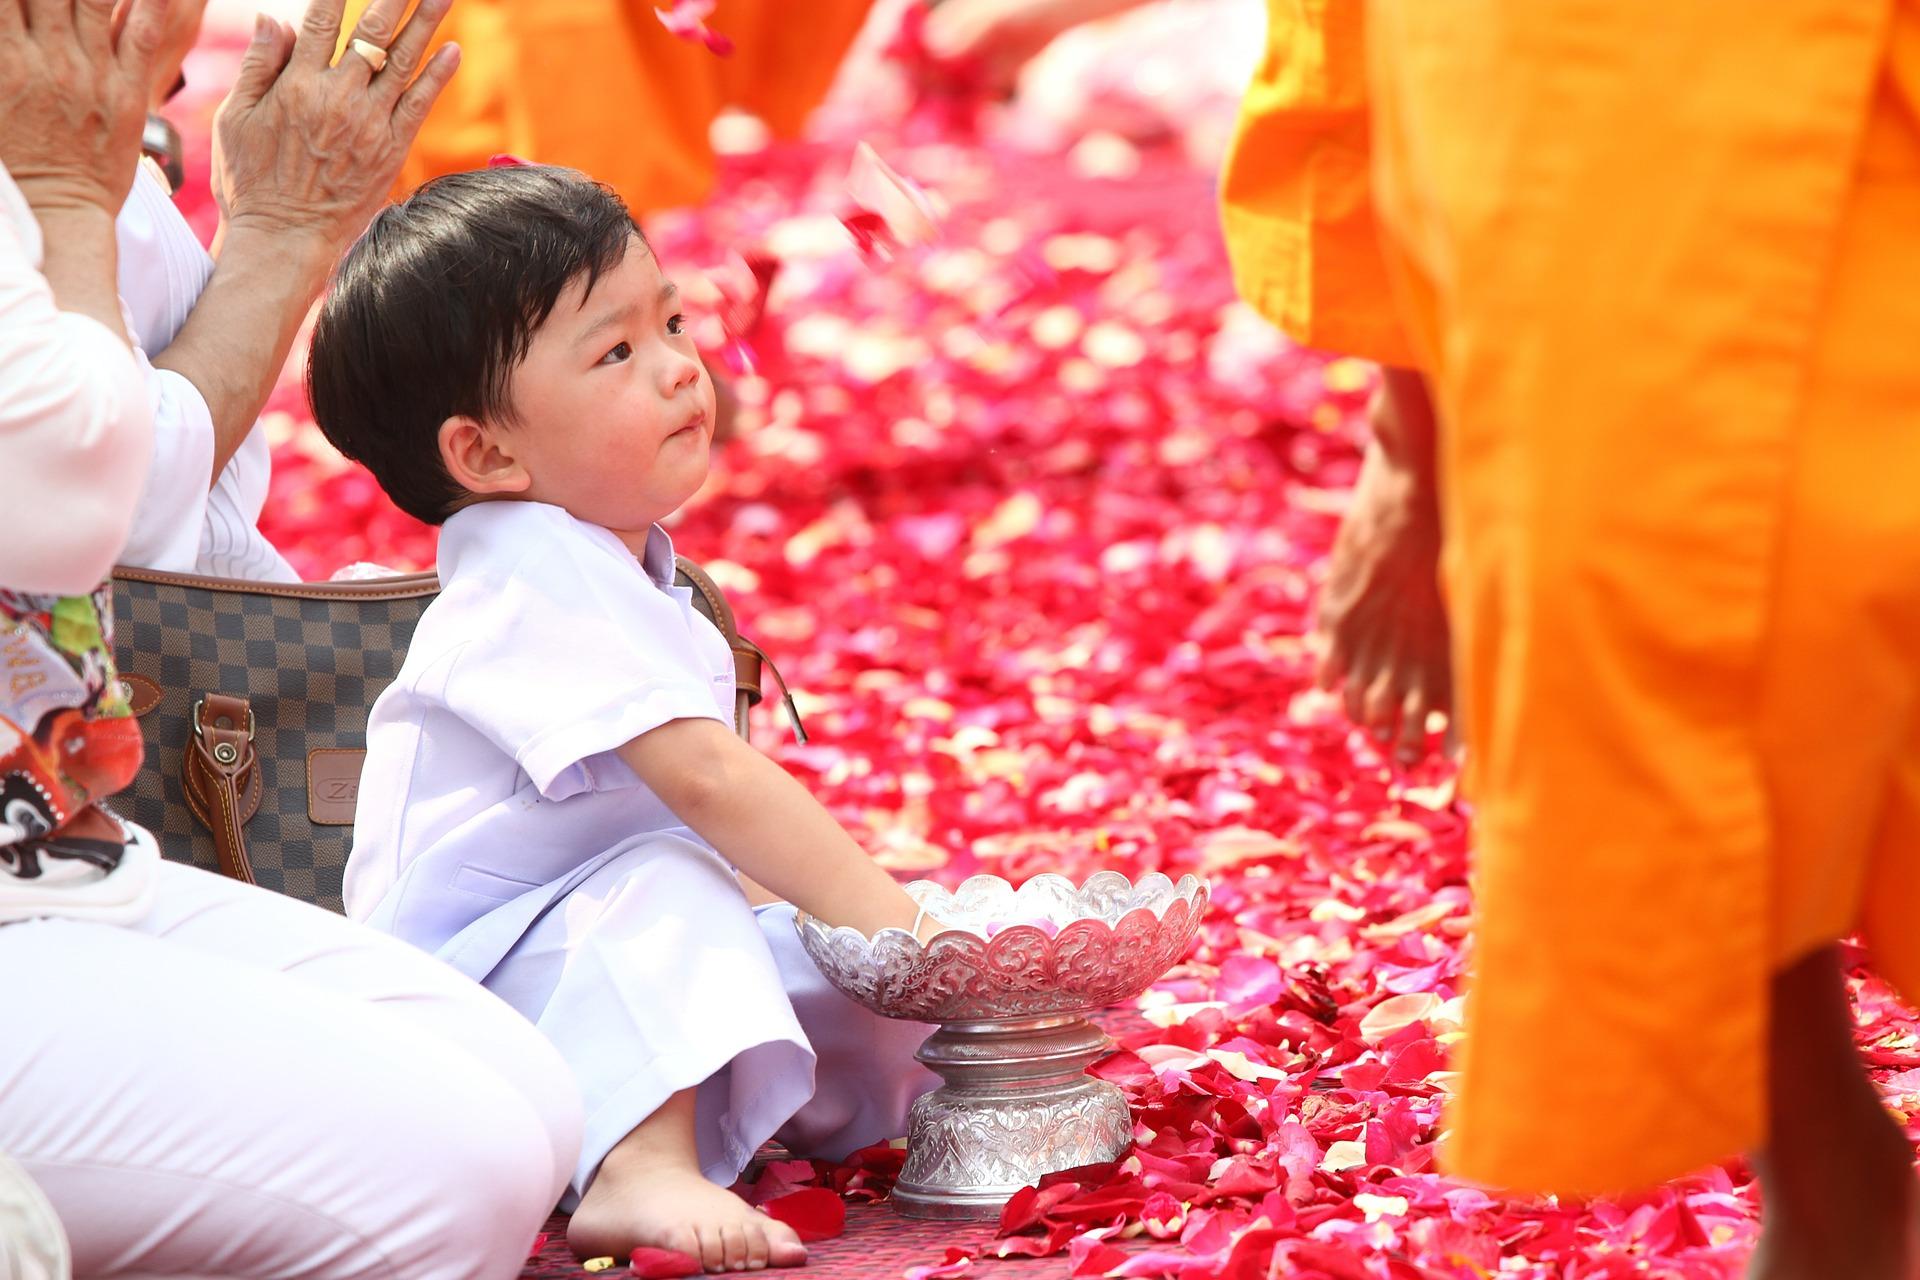 Mash&Co buddhists